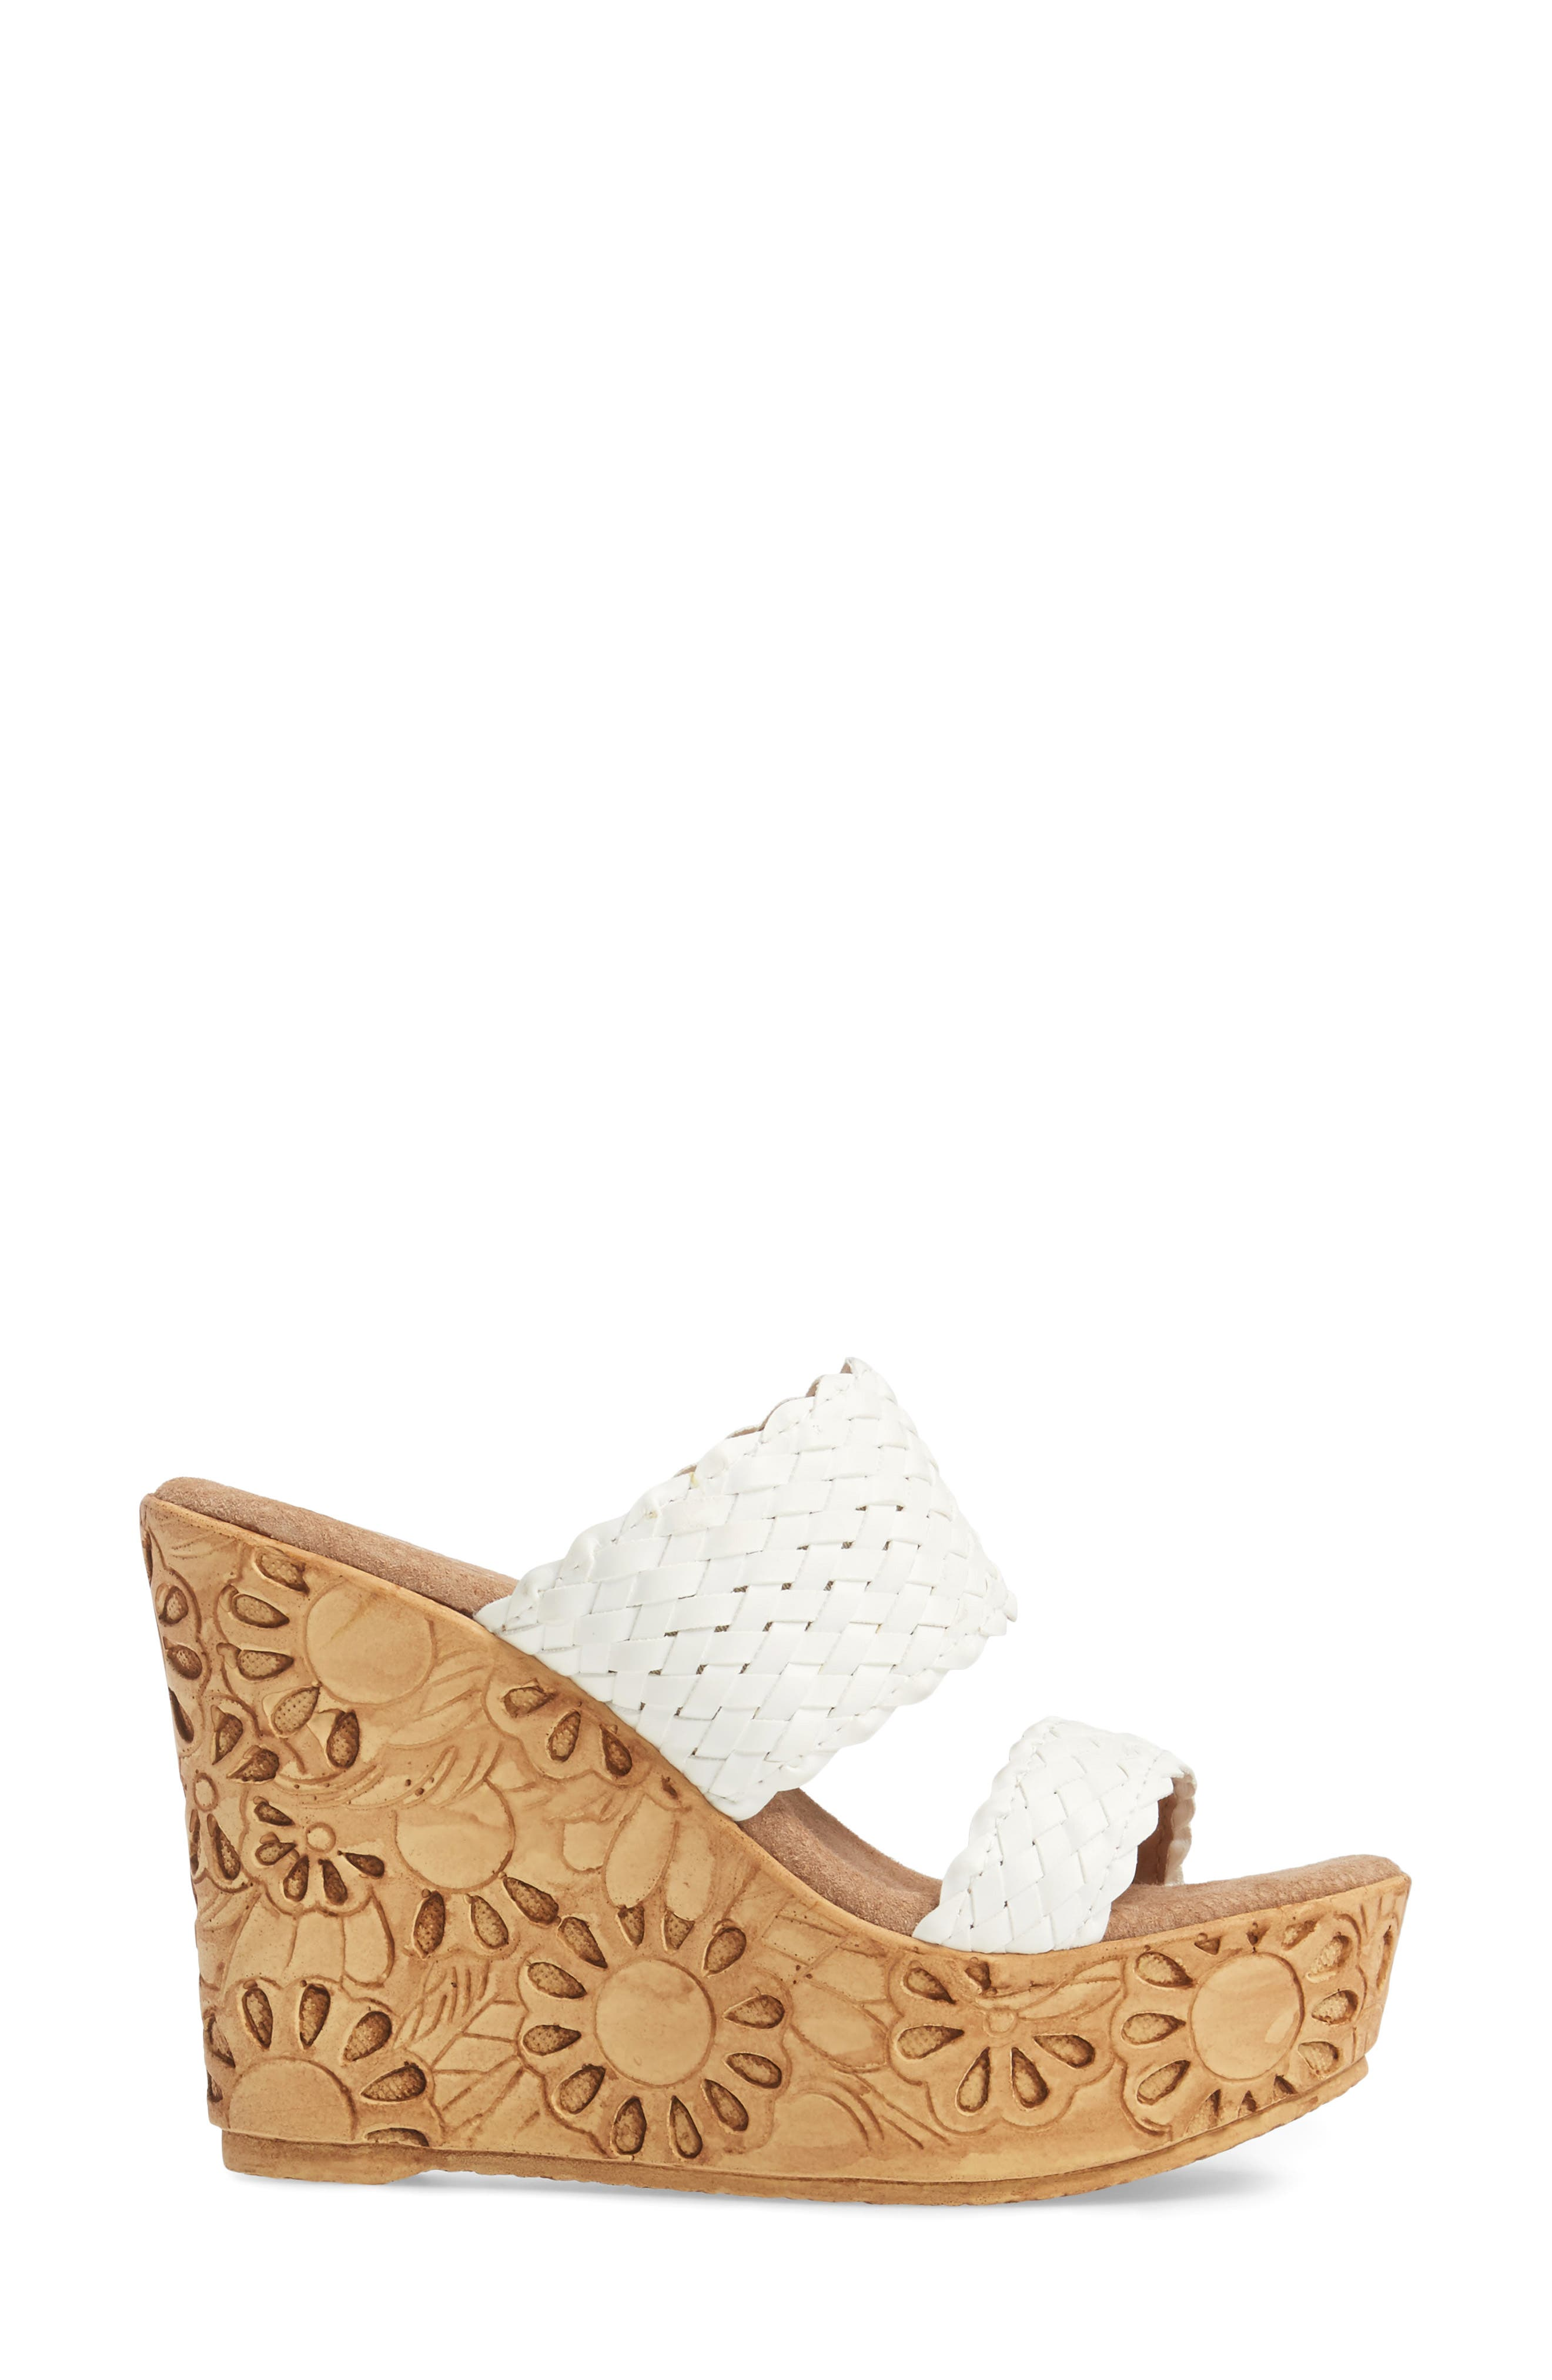 Halima Platform Wedge Sandal,                             Alternate thumbnail 3, color,                             White Leather